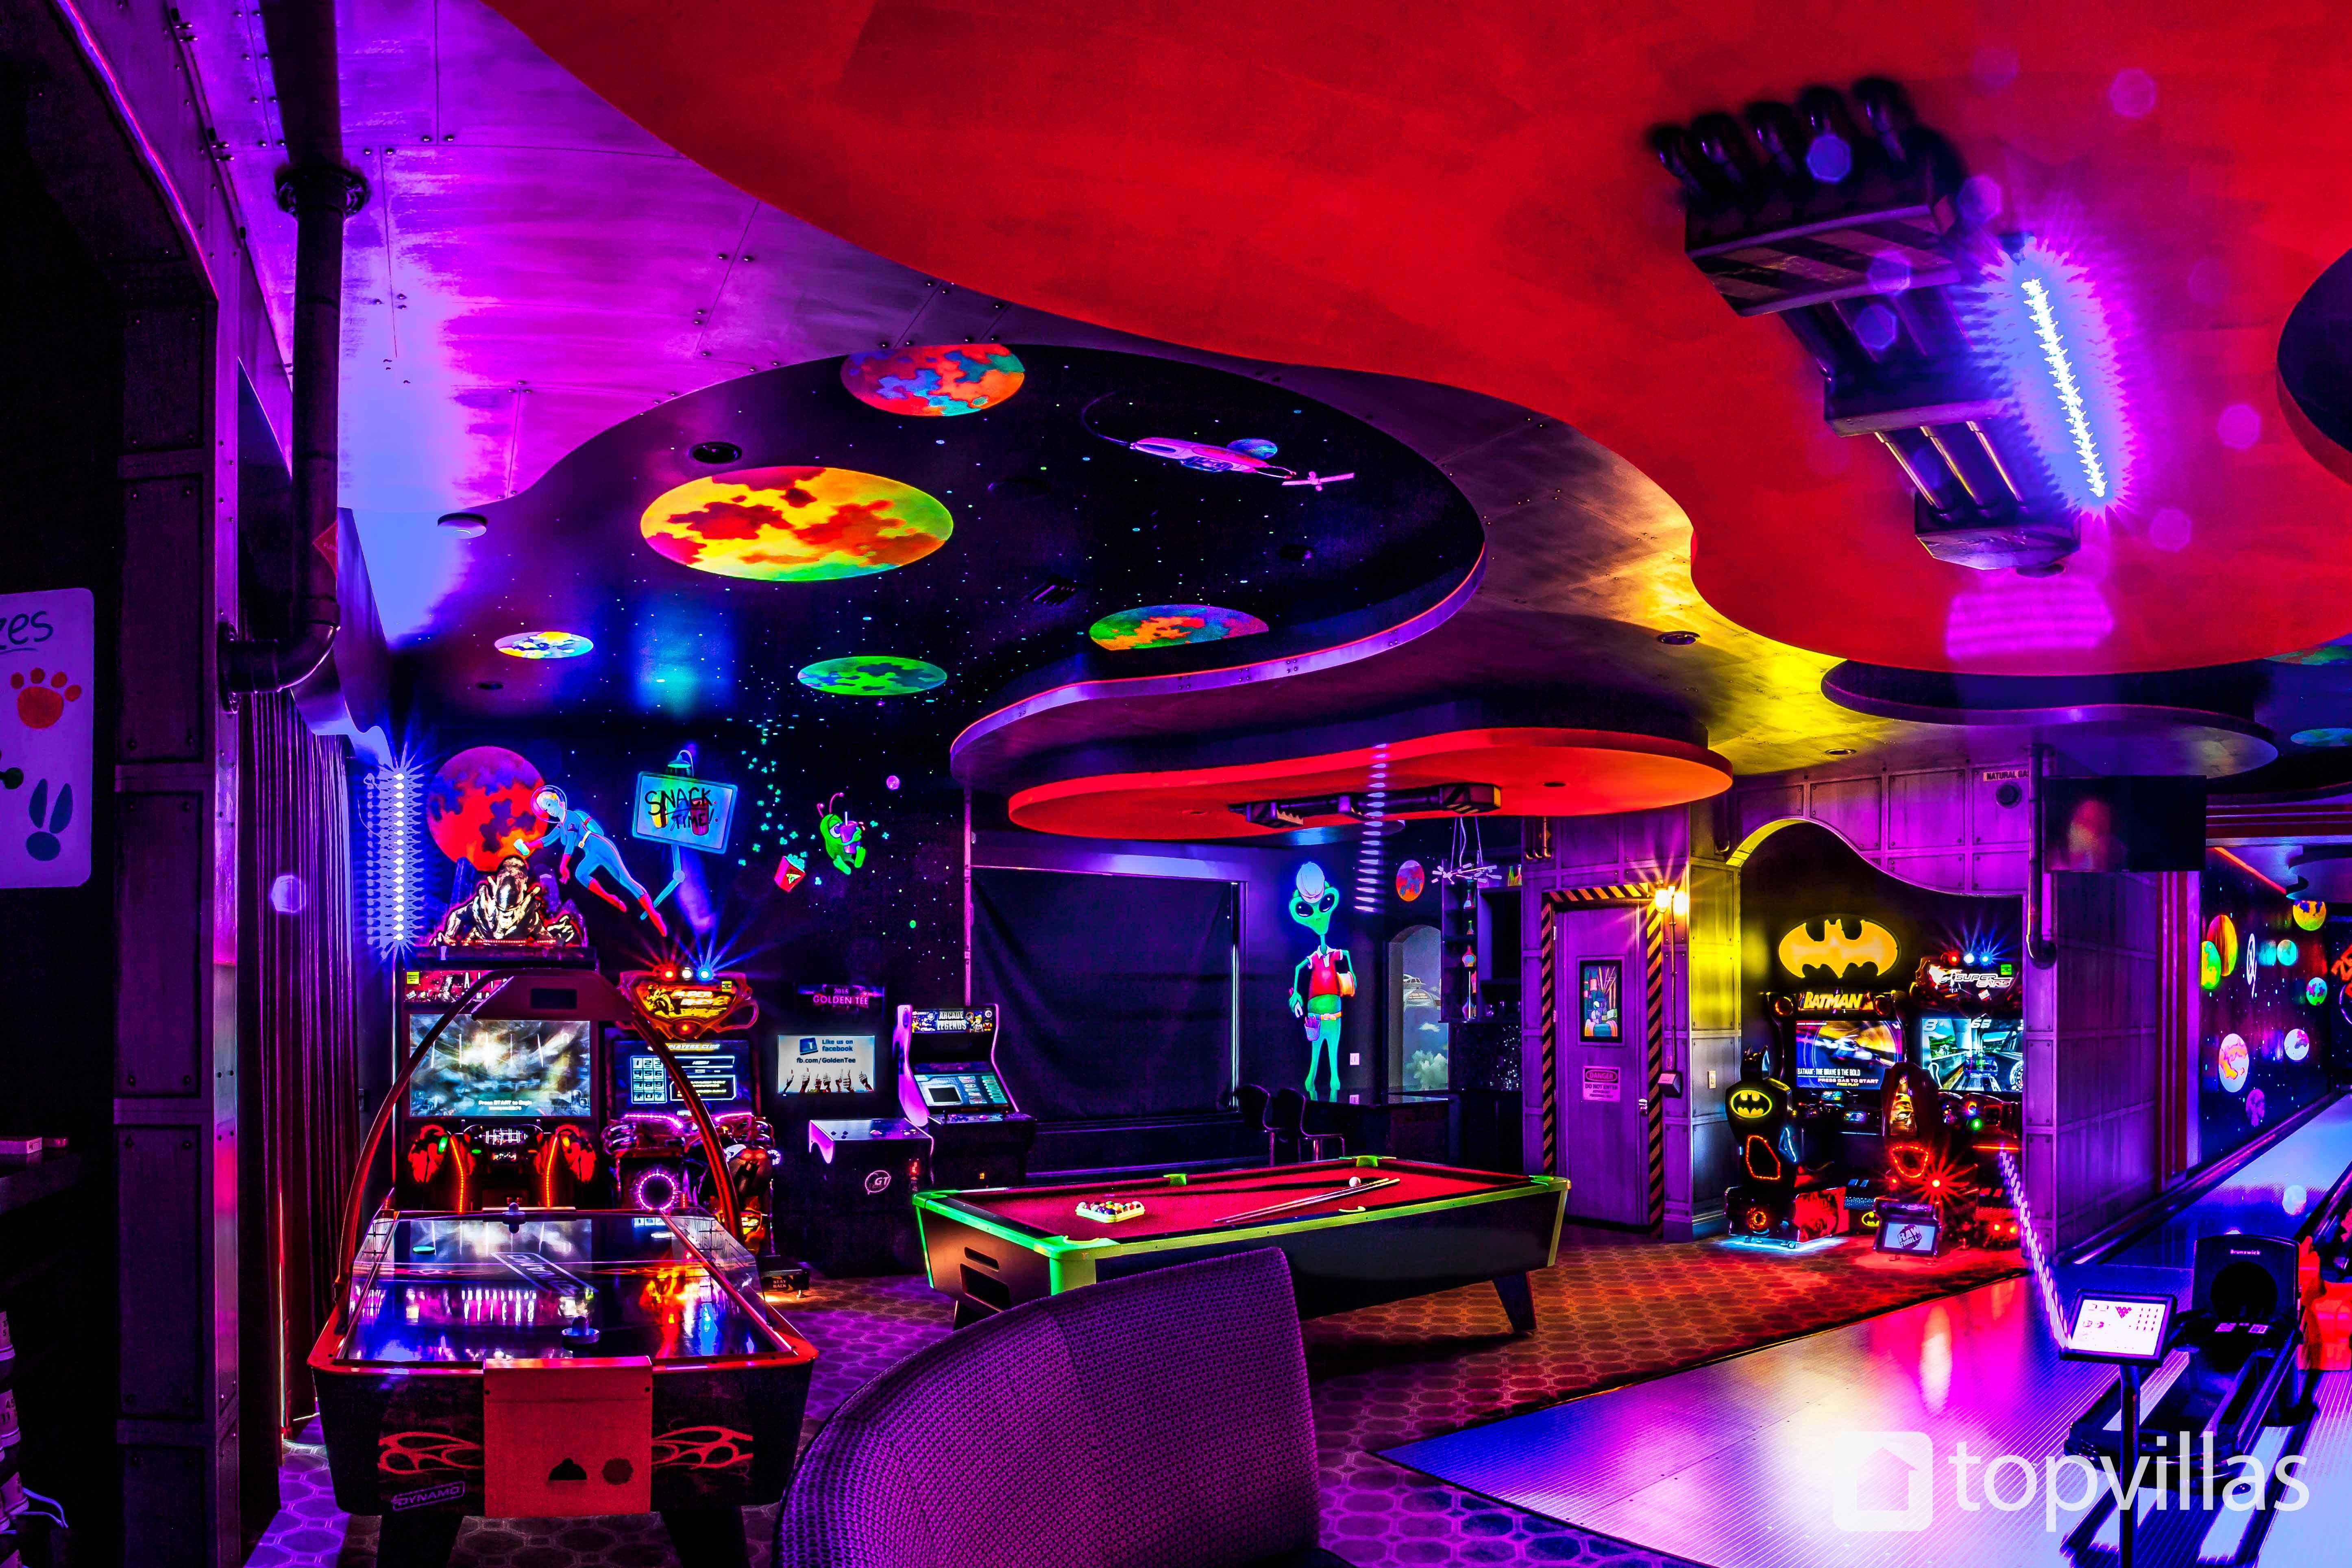 reunion resort 10000's games room